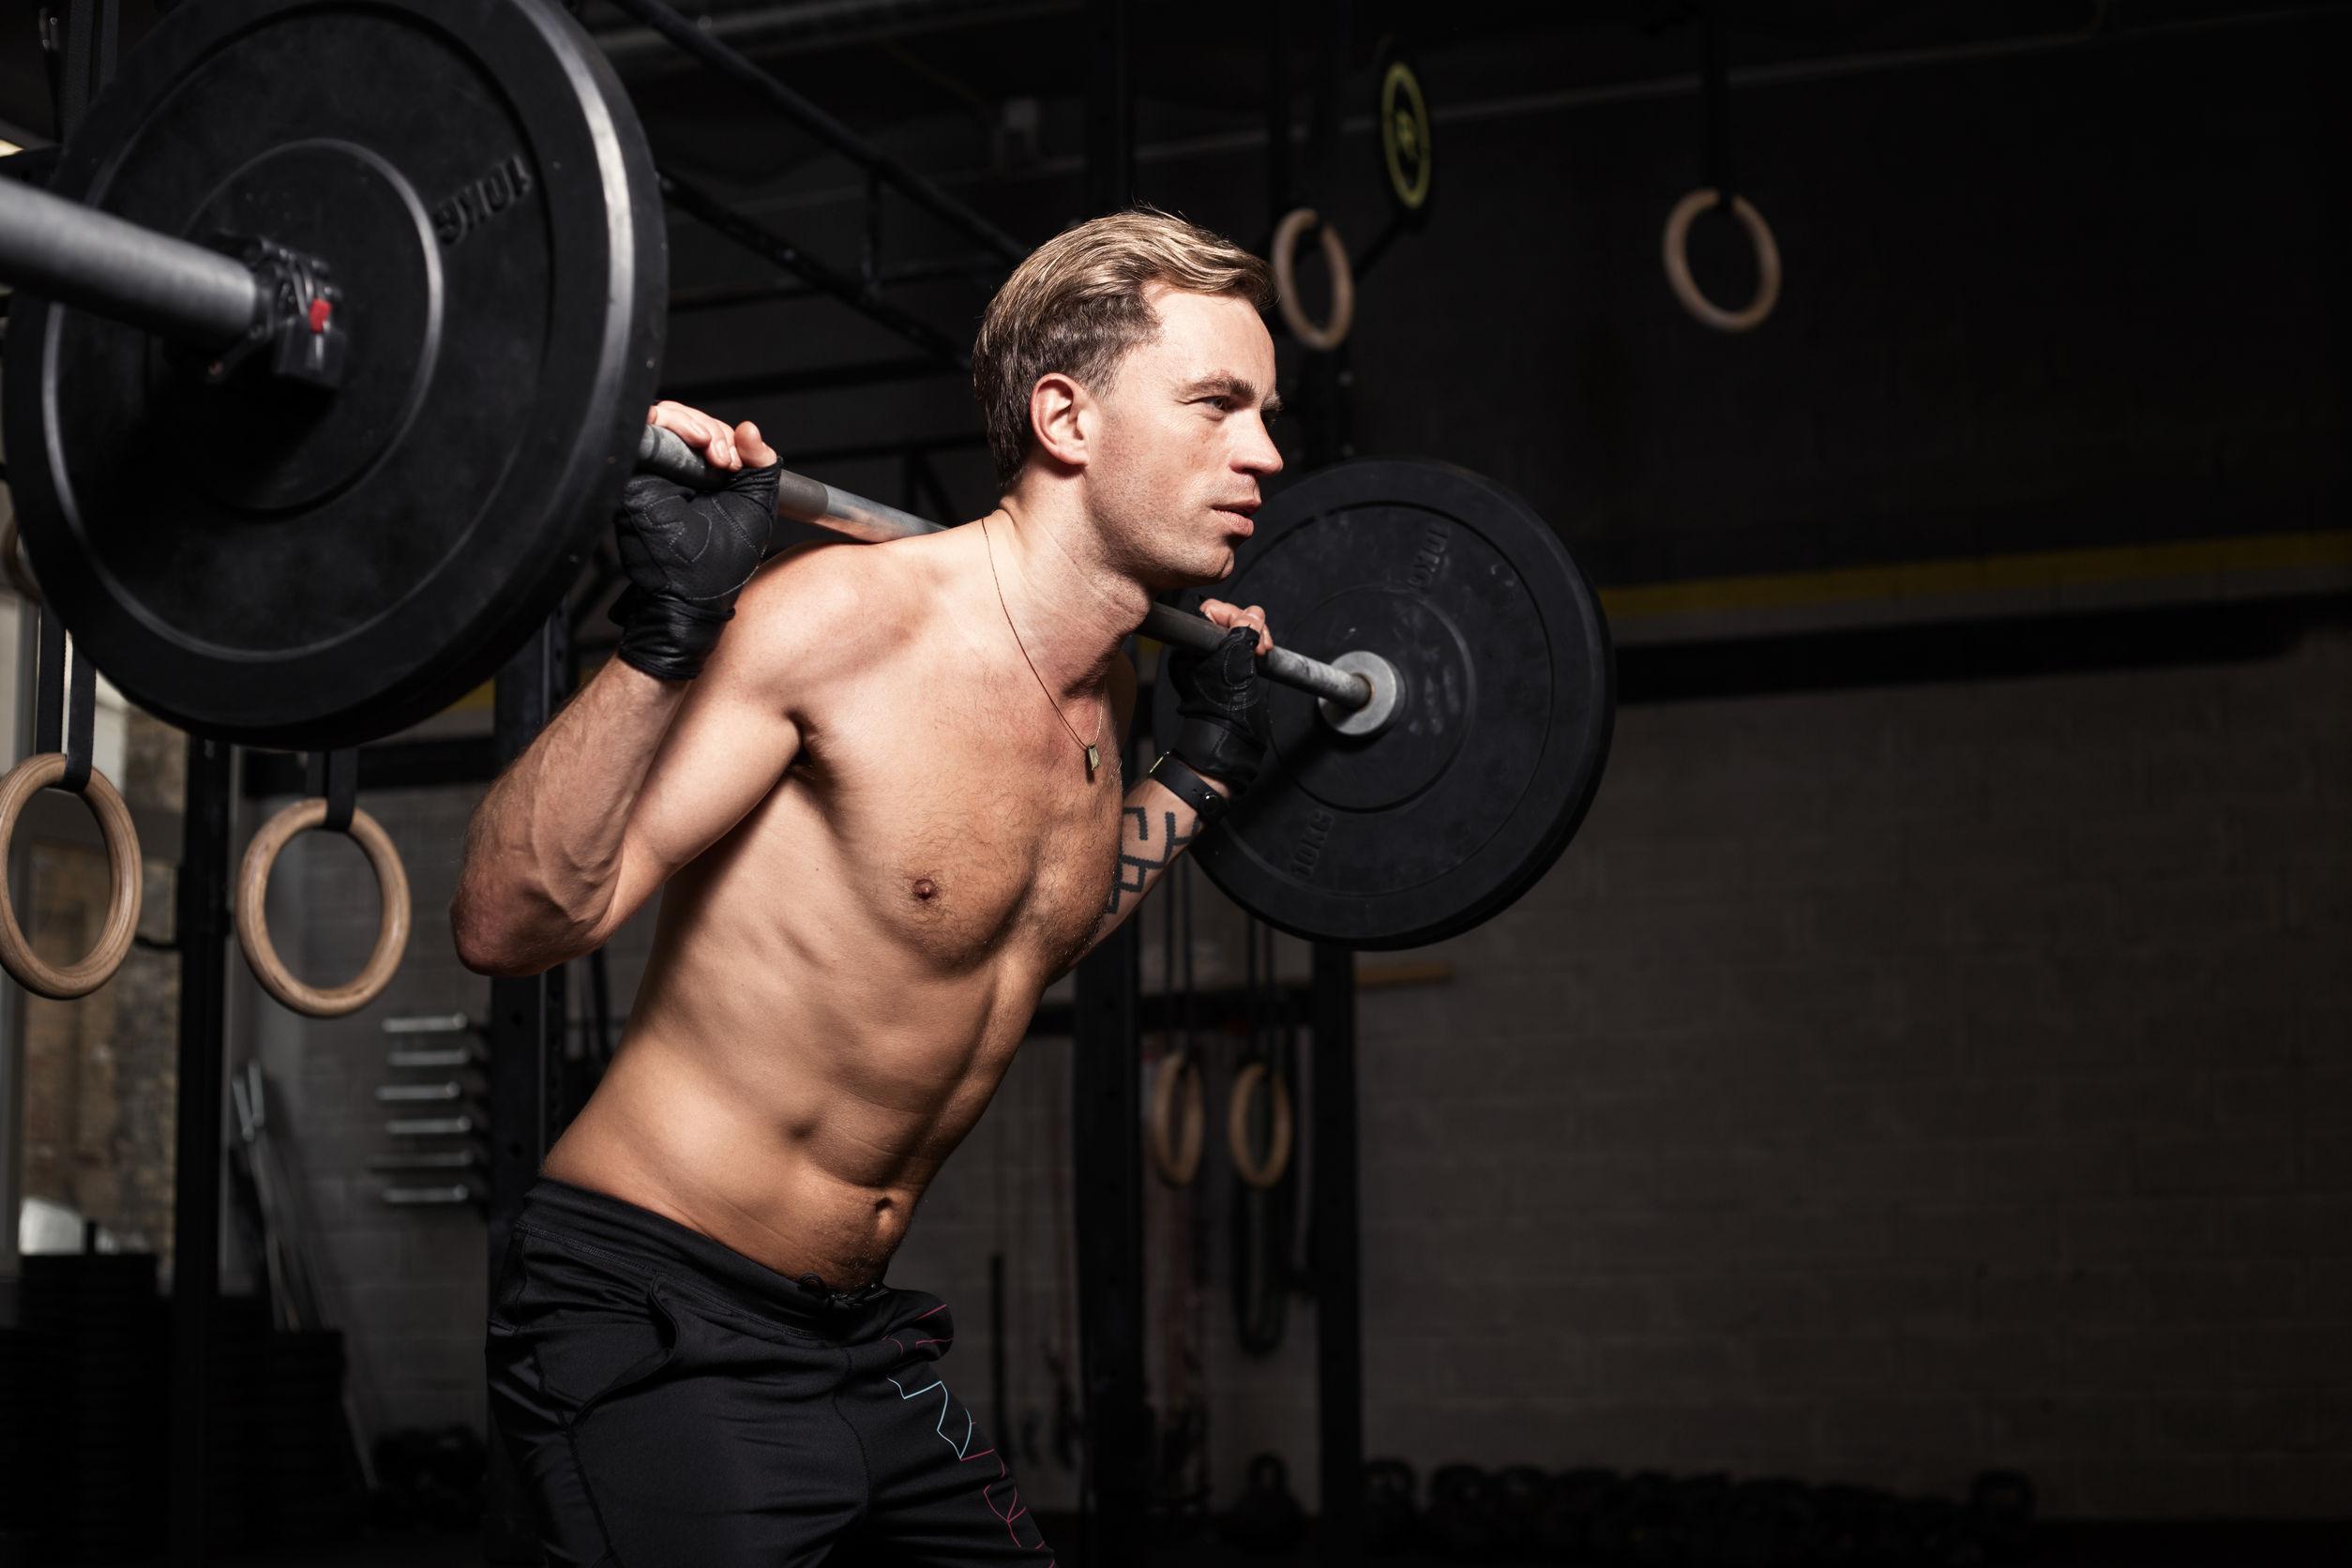 Bao tay tập gym